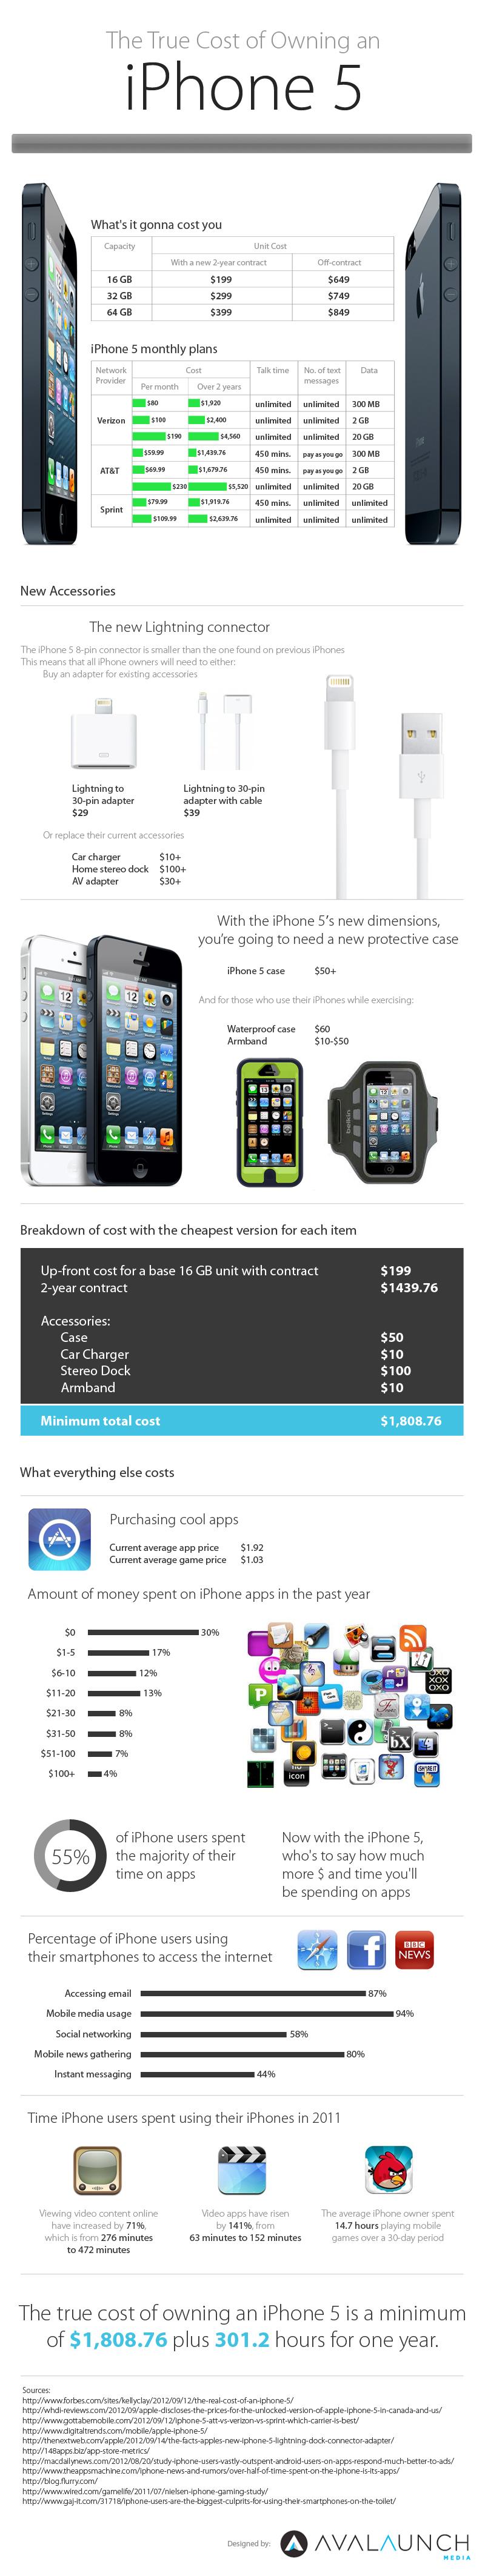 iPhone True Cost, infographic, iphone infographic, iphone 5 cost, iphone 5 cost plan, iphone 5 contract cost